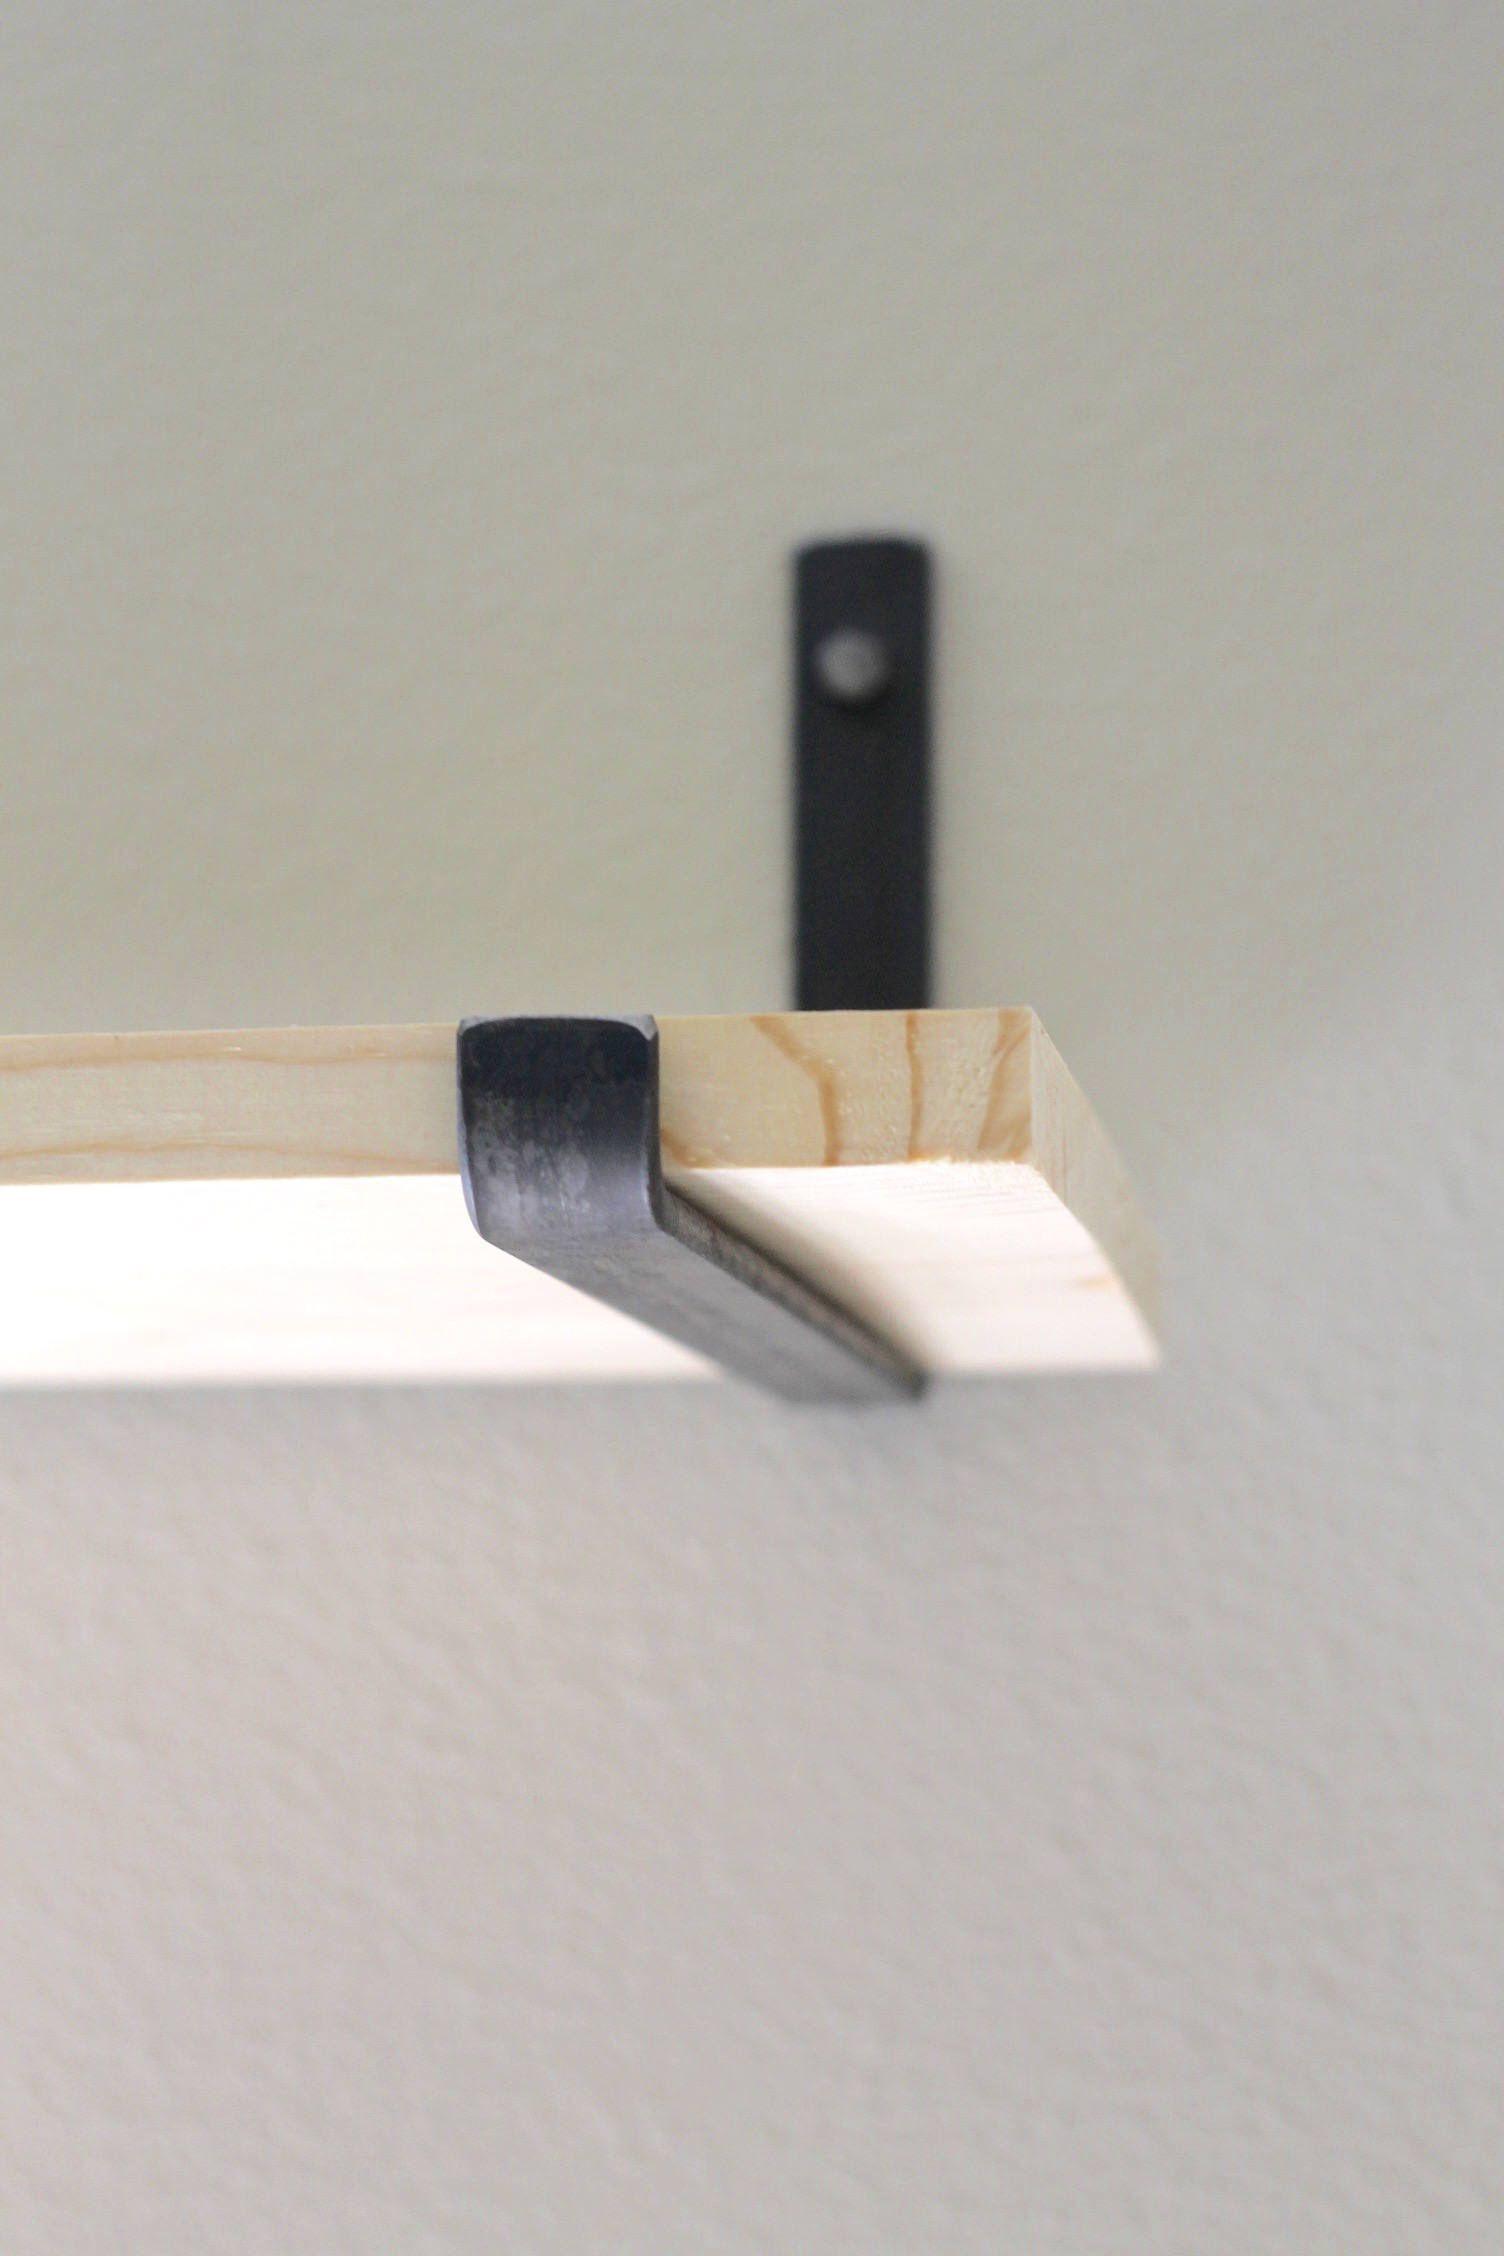 Heavy Duty Wall Mounted DIY Shelving Brackets Hanging Custom Pipe Brackets for Floating Shelves,Coated Finish.Hardware Included Industrial Black Iron Pipe Floating Shelf Bracket 8 Inch Set of 6